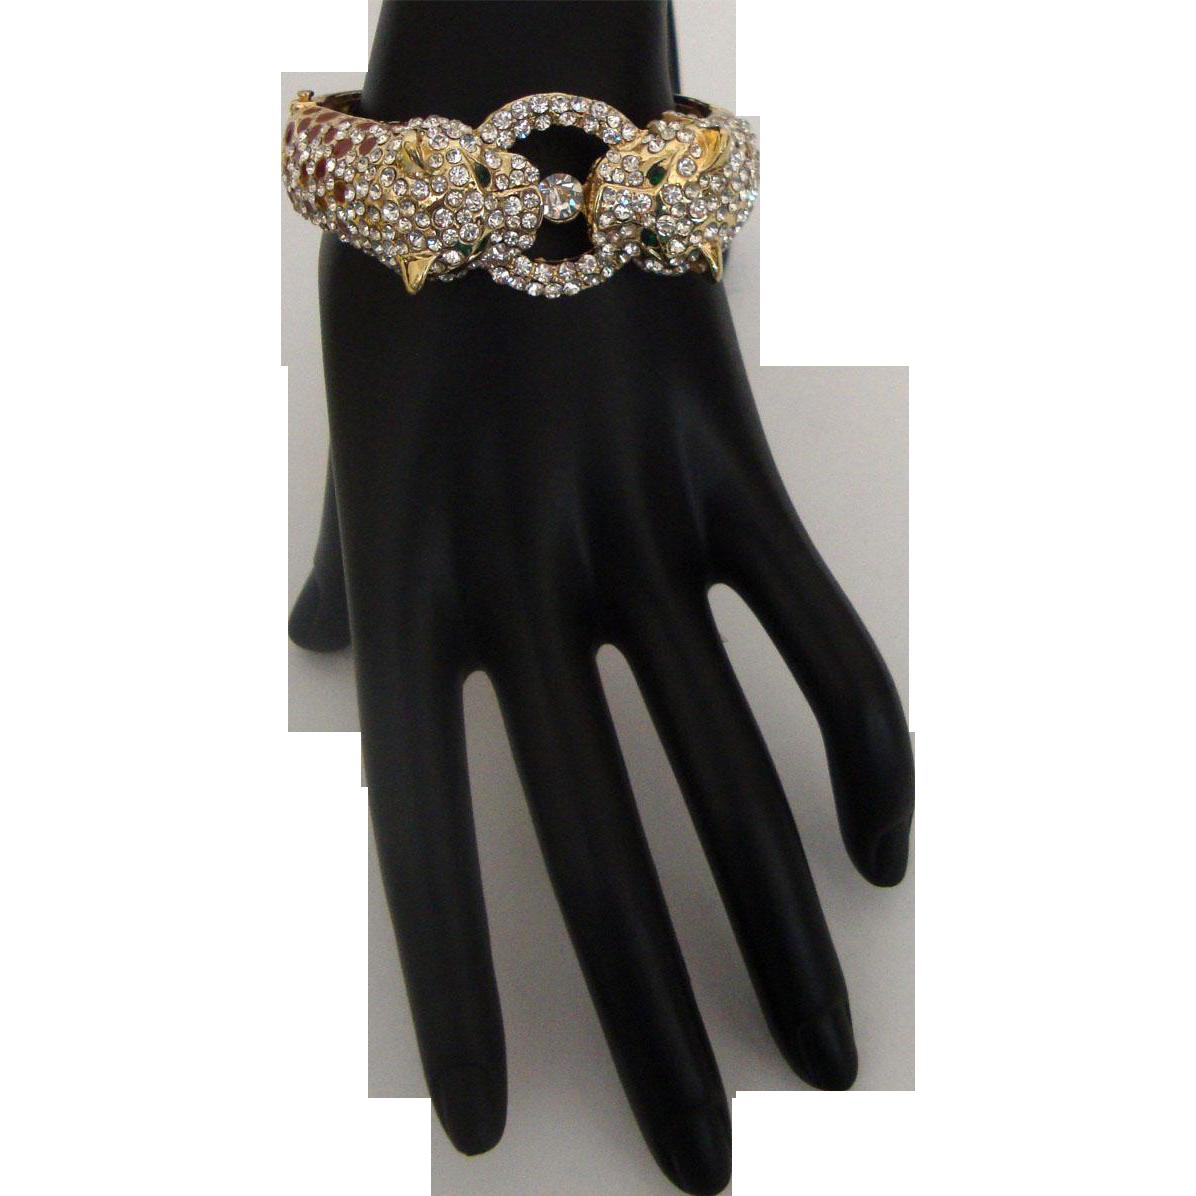 Signed KJL - Kenneth Jay Lane Cheetah or Leopard Clamper Bracelet: Brown Spots: New/Old Stock